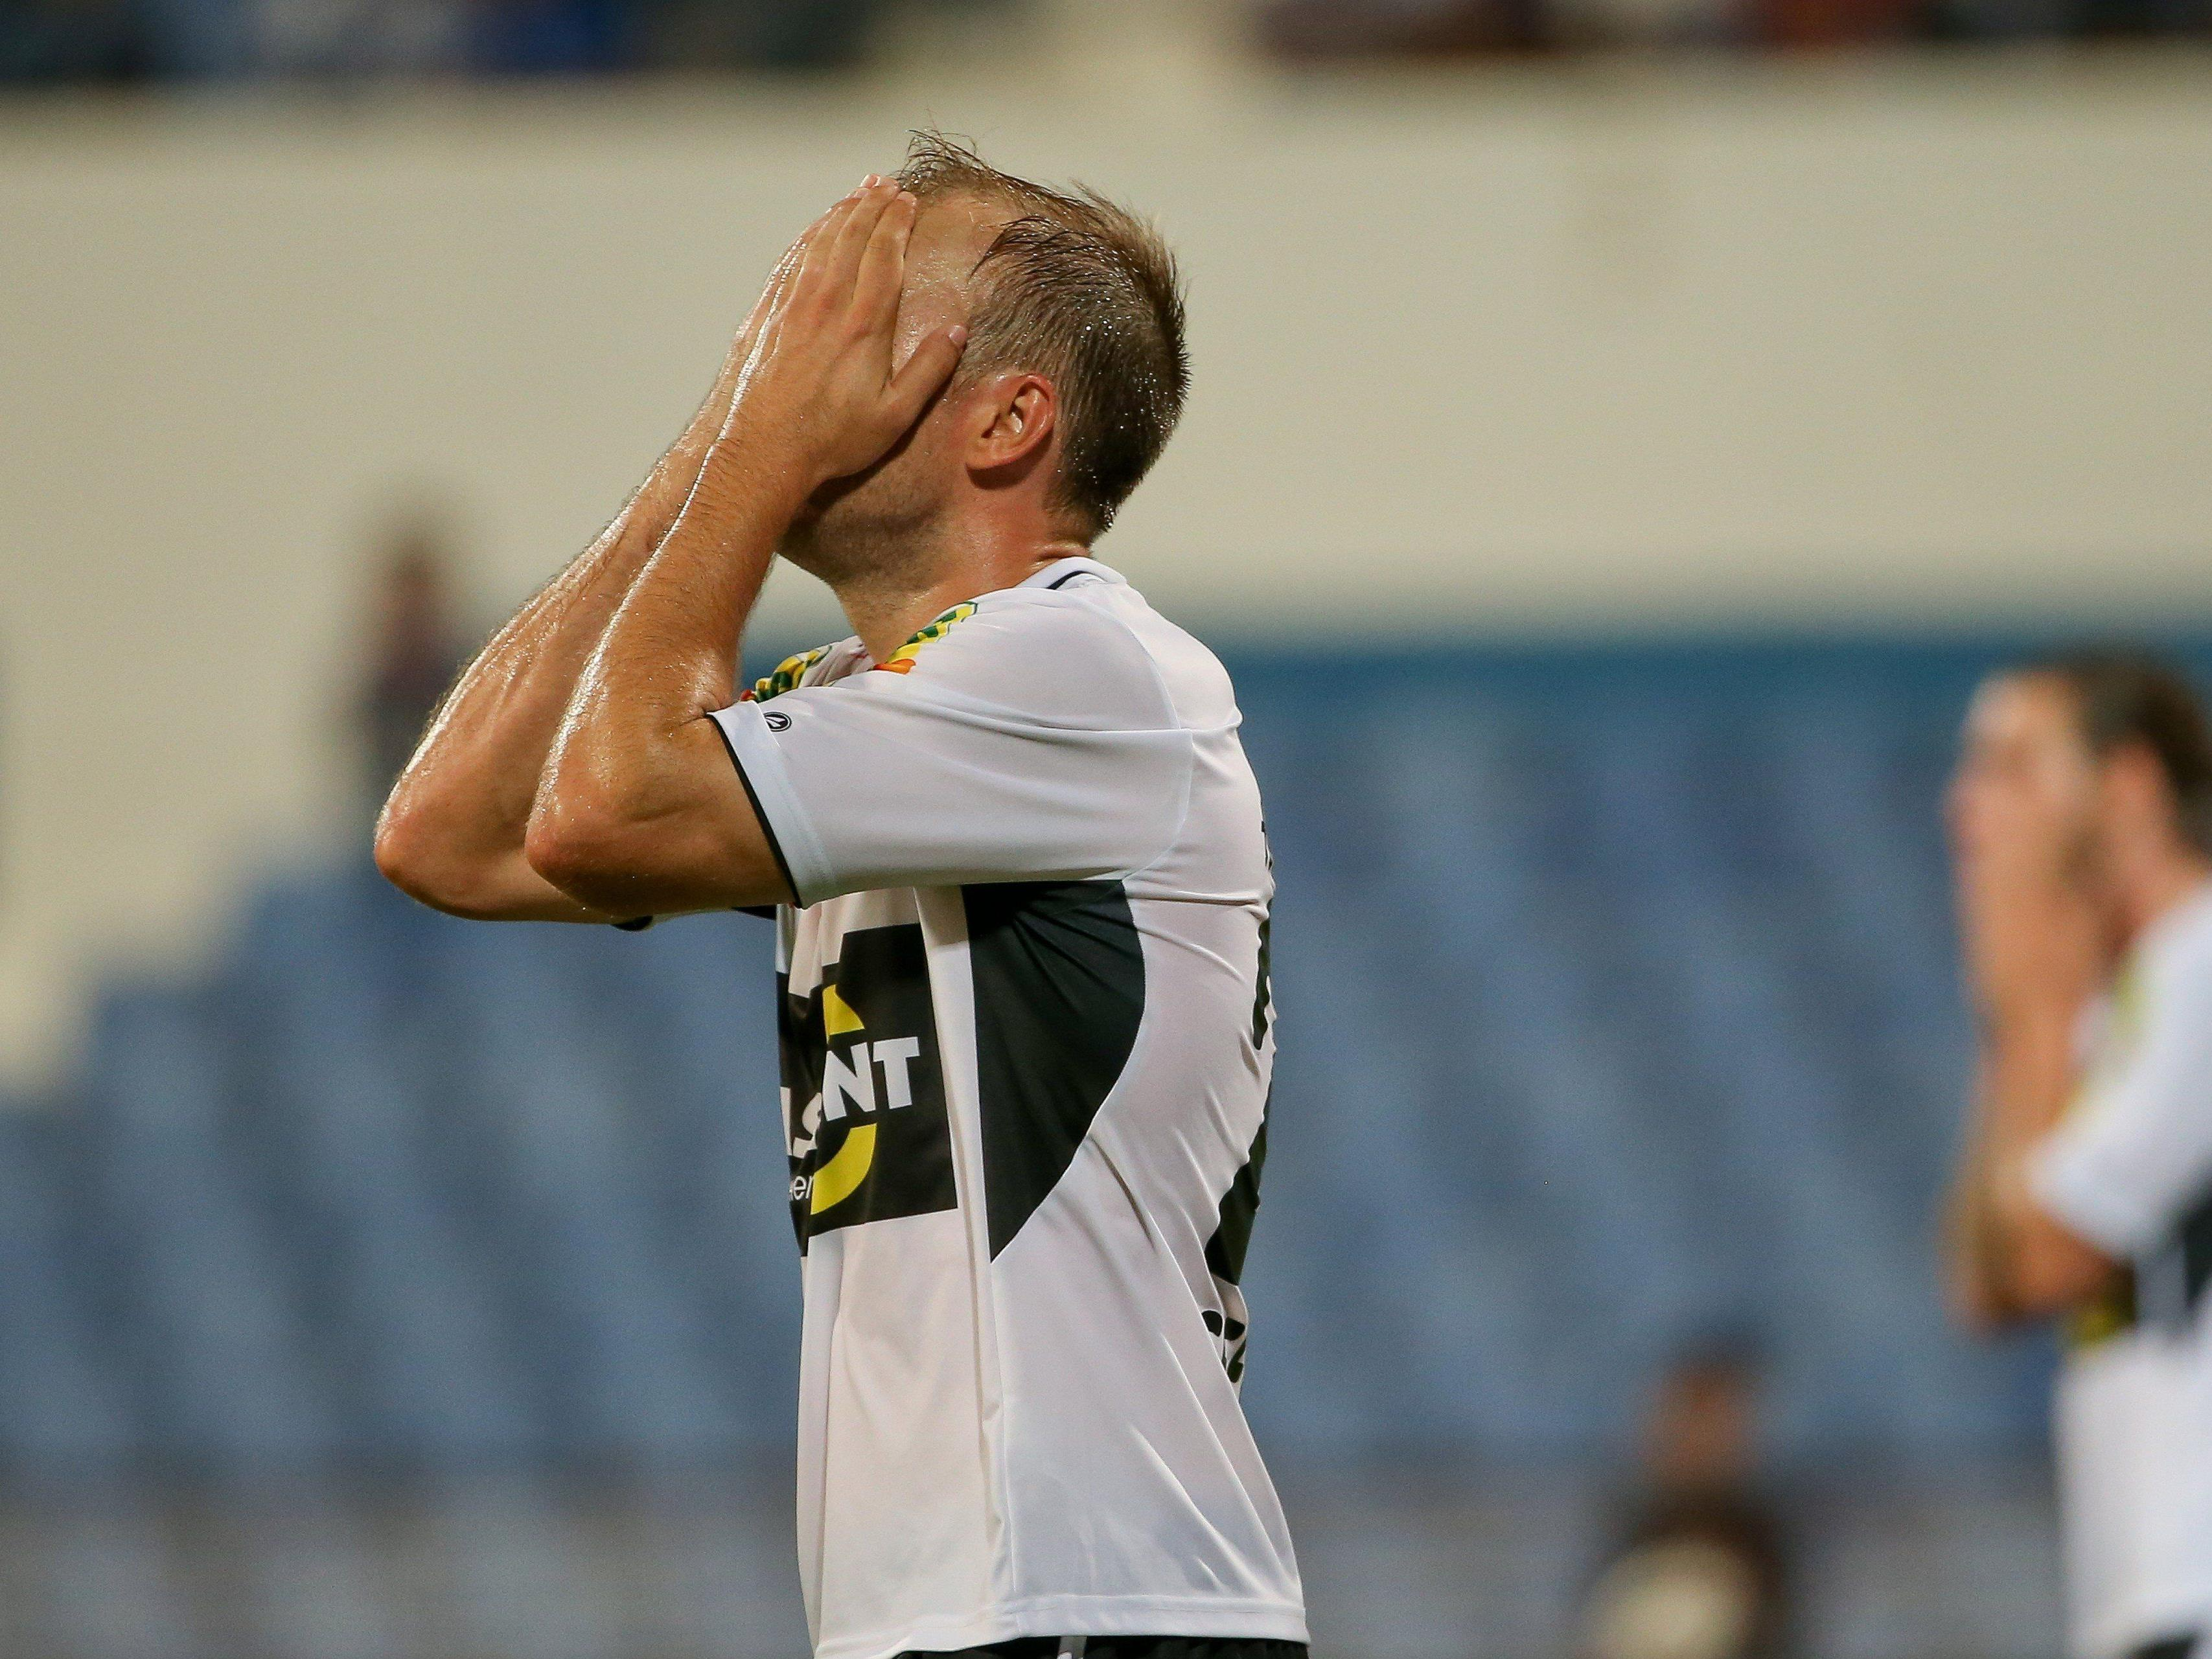 Altach verpasst EL-Gruppenphase - 0:0 bei Belenenses